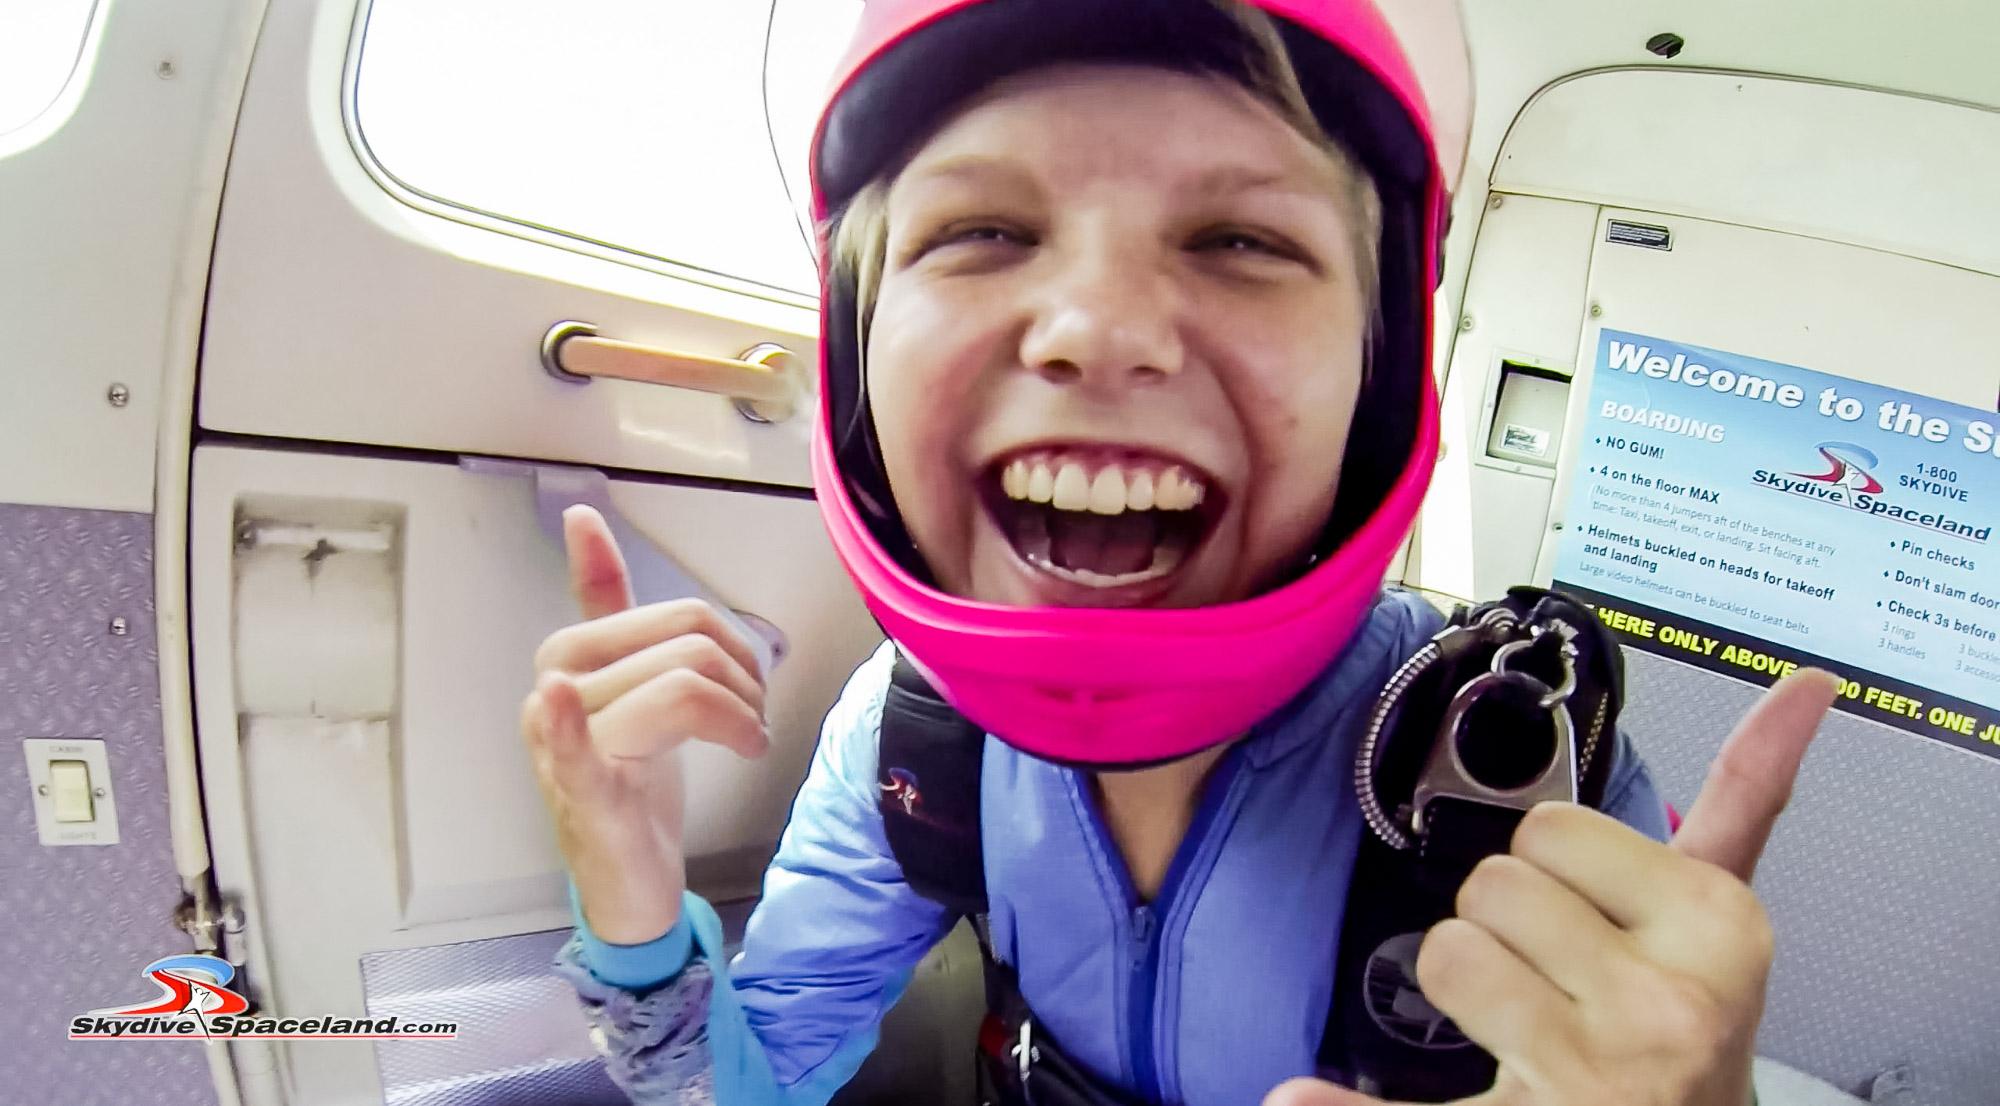 Skydiving Day-Video Screenshots-0012.jpg